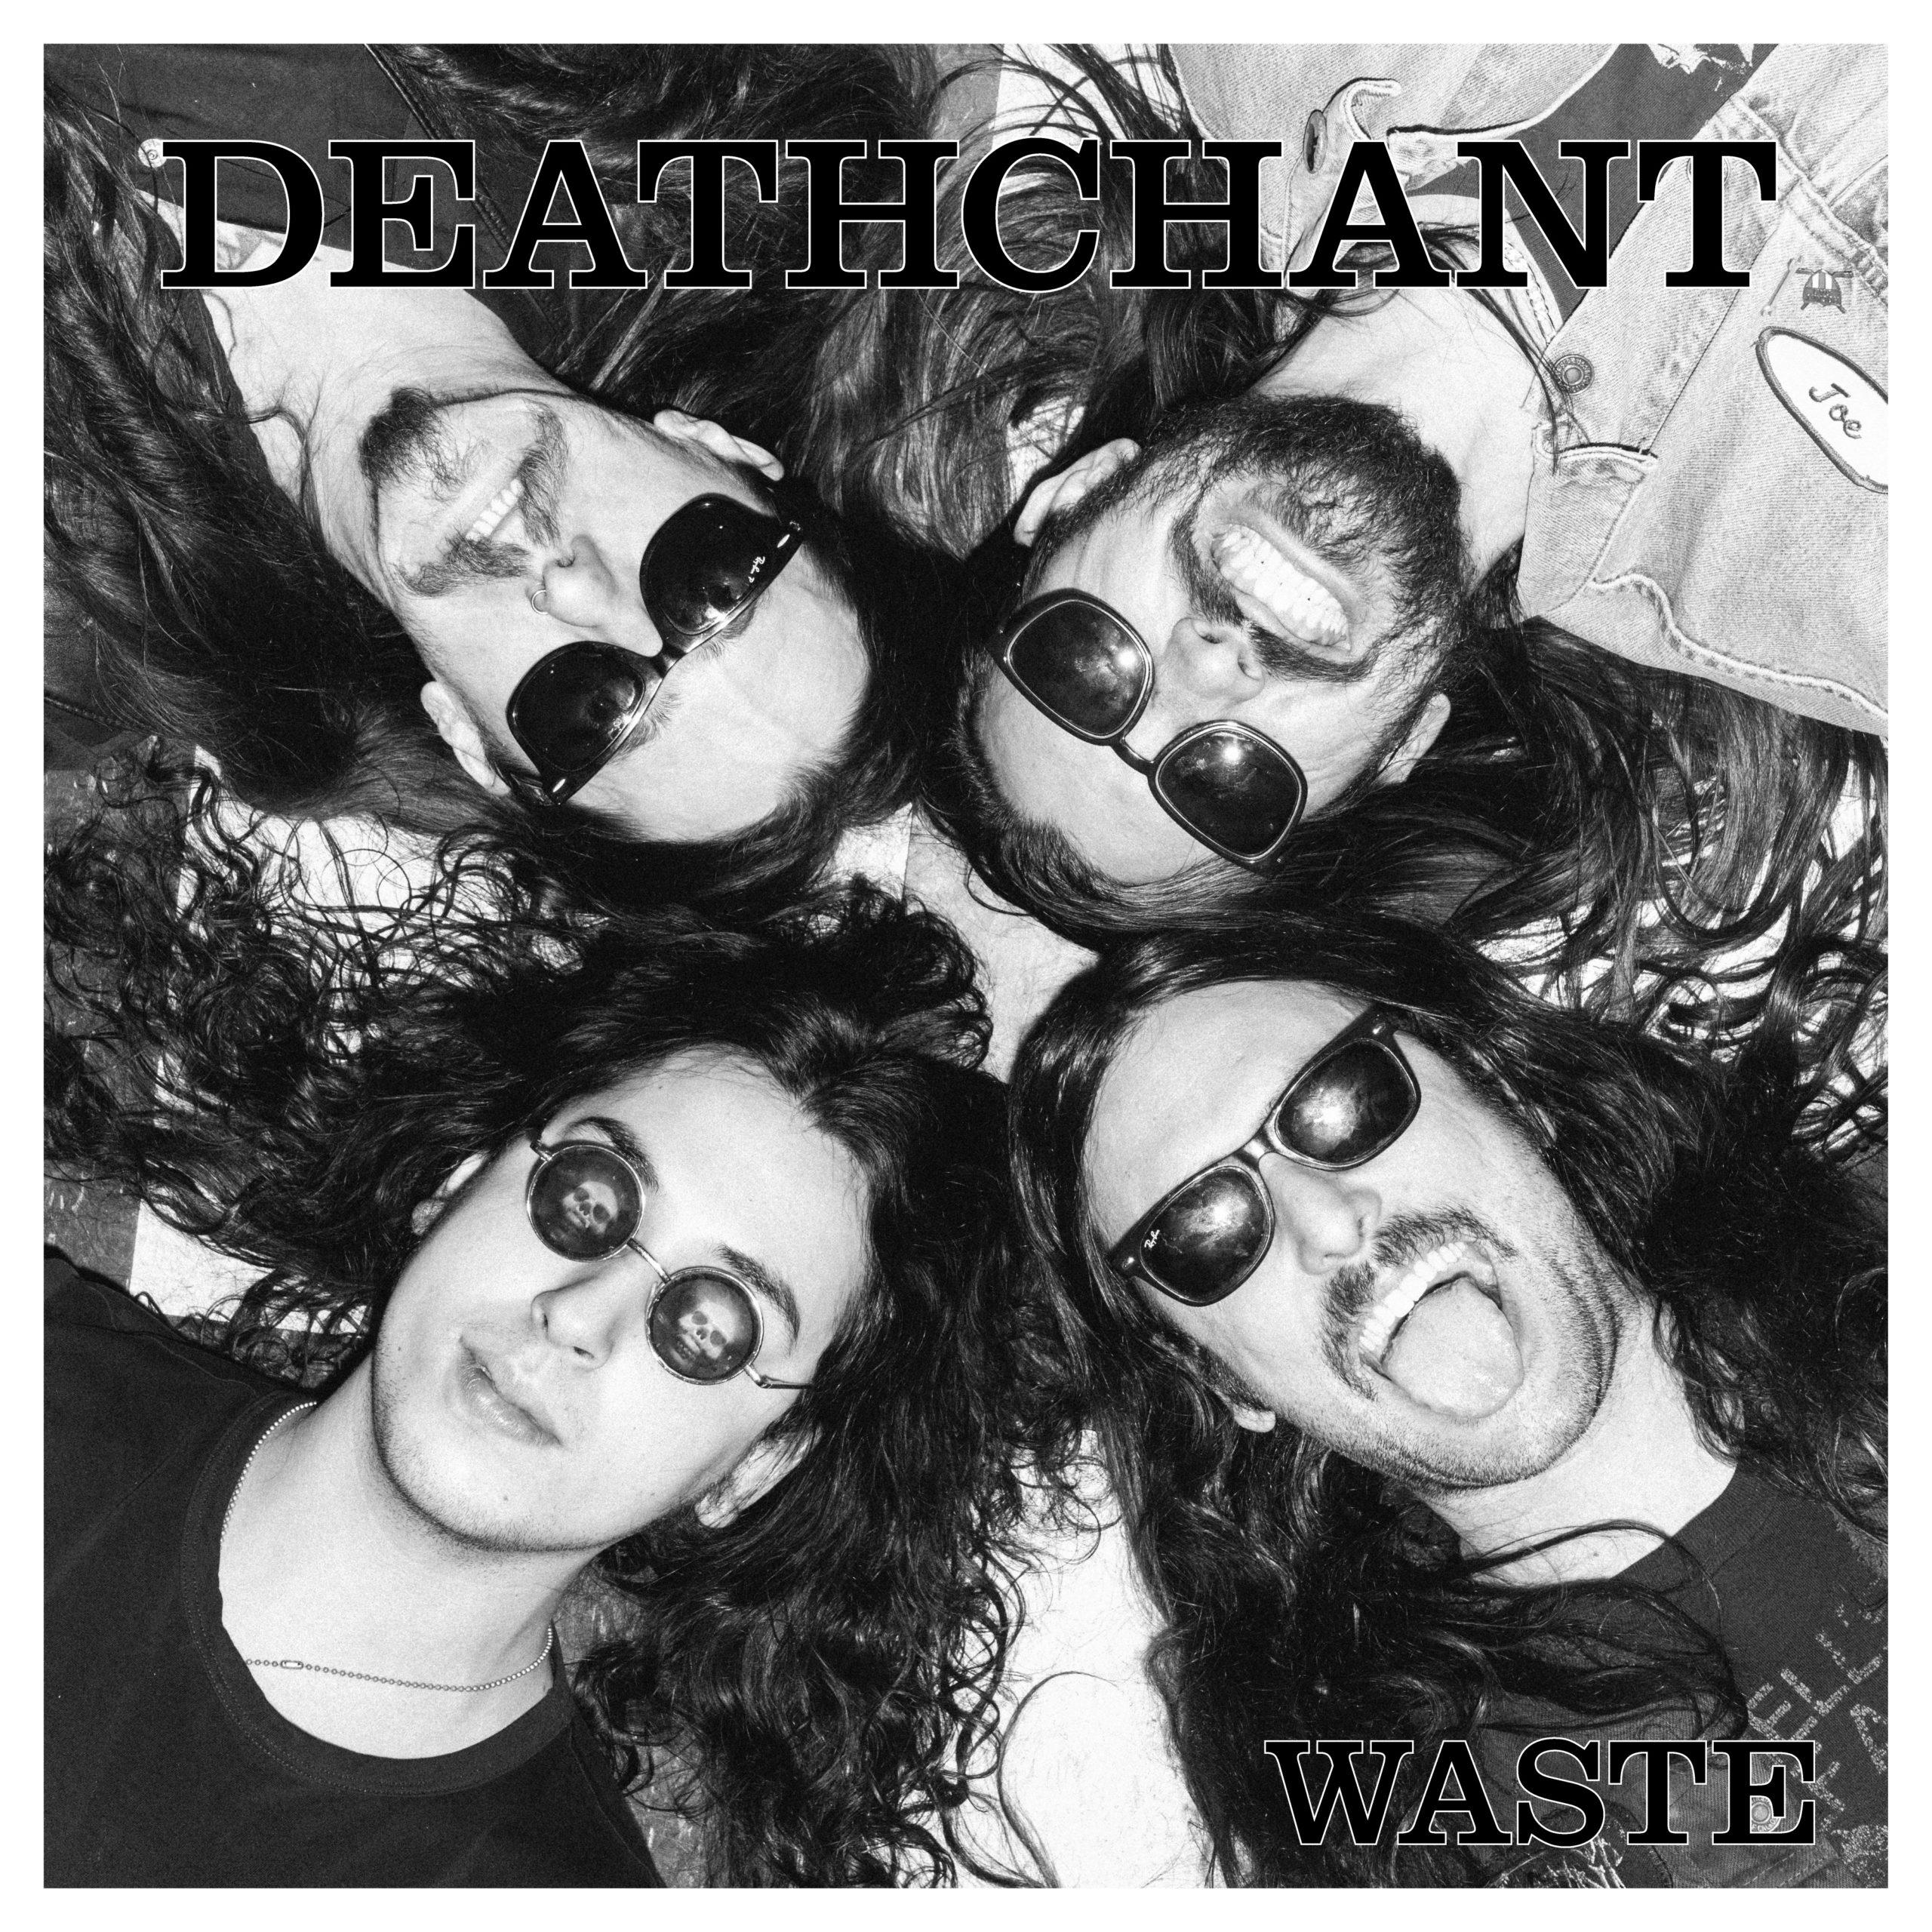 deathchant waste